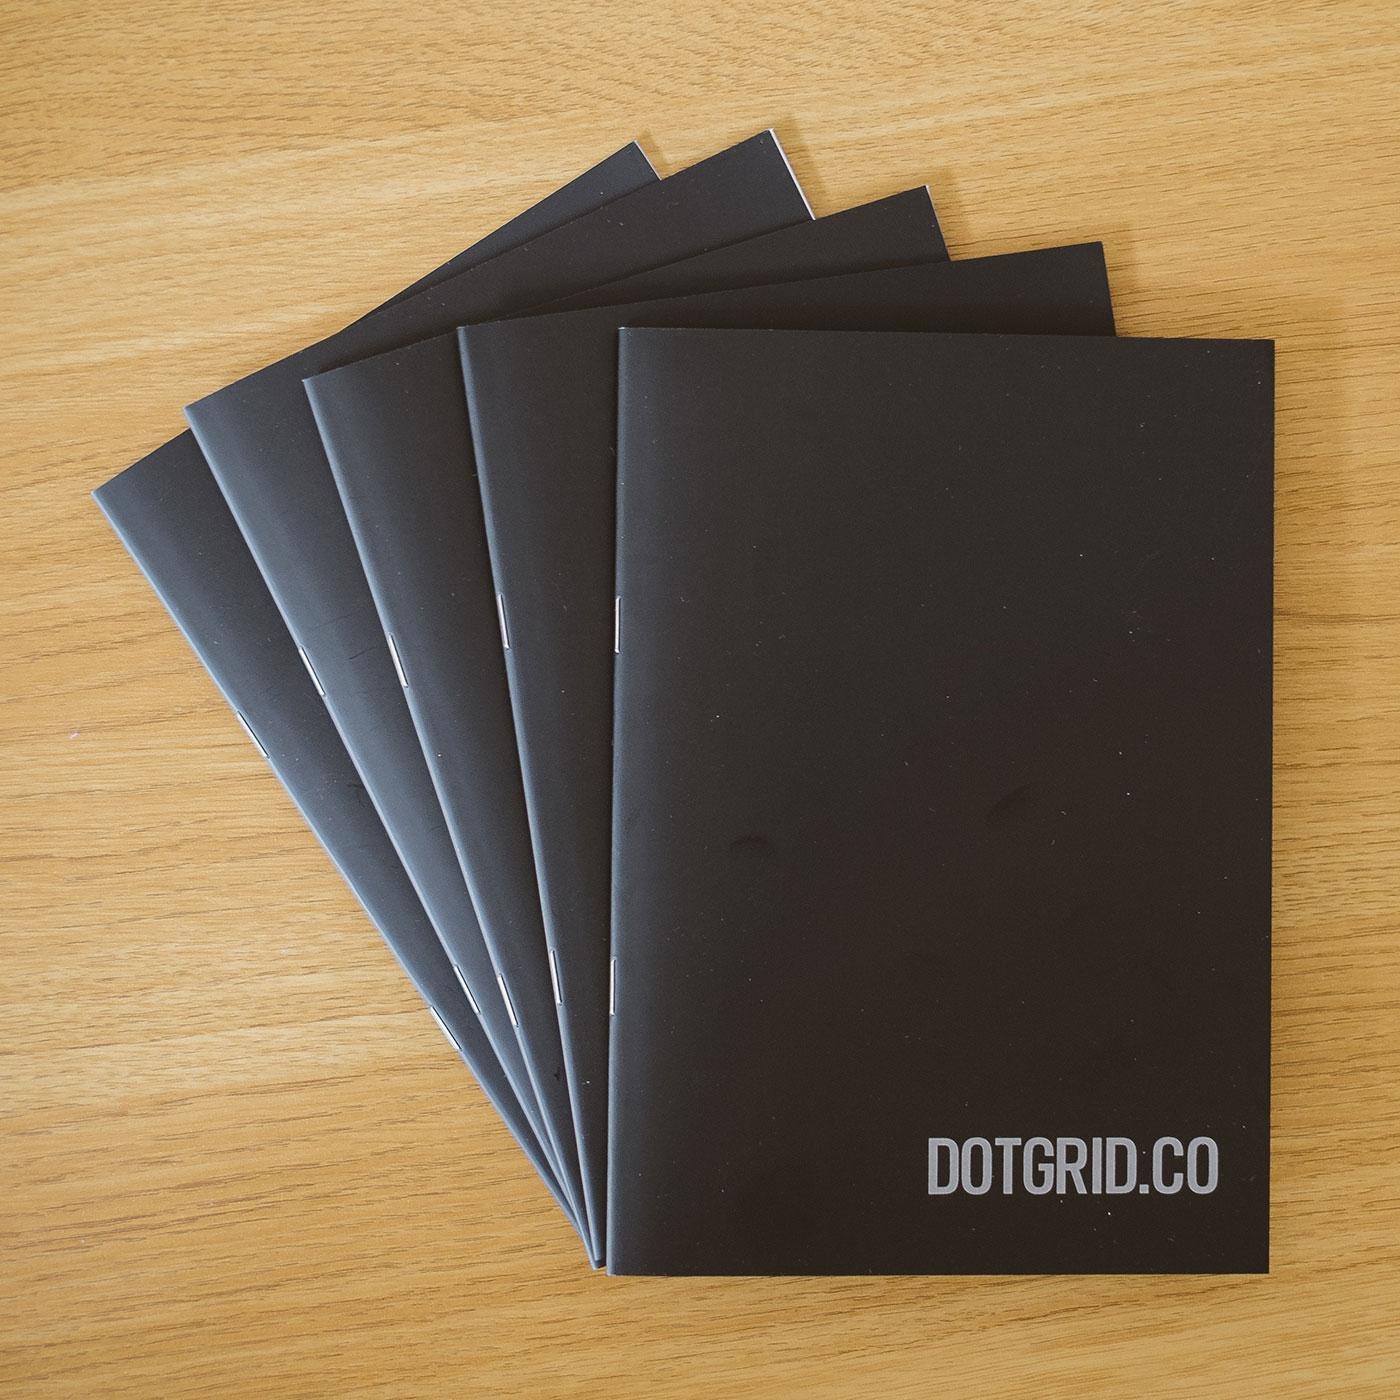 dotgridco-dot-grid-notepads-a5-6-web.jpg